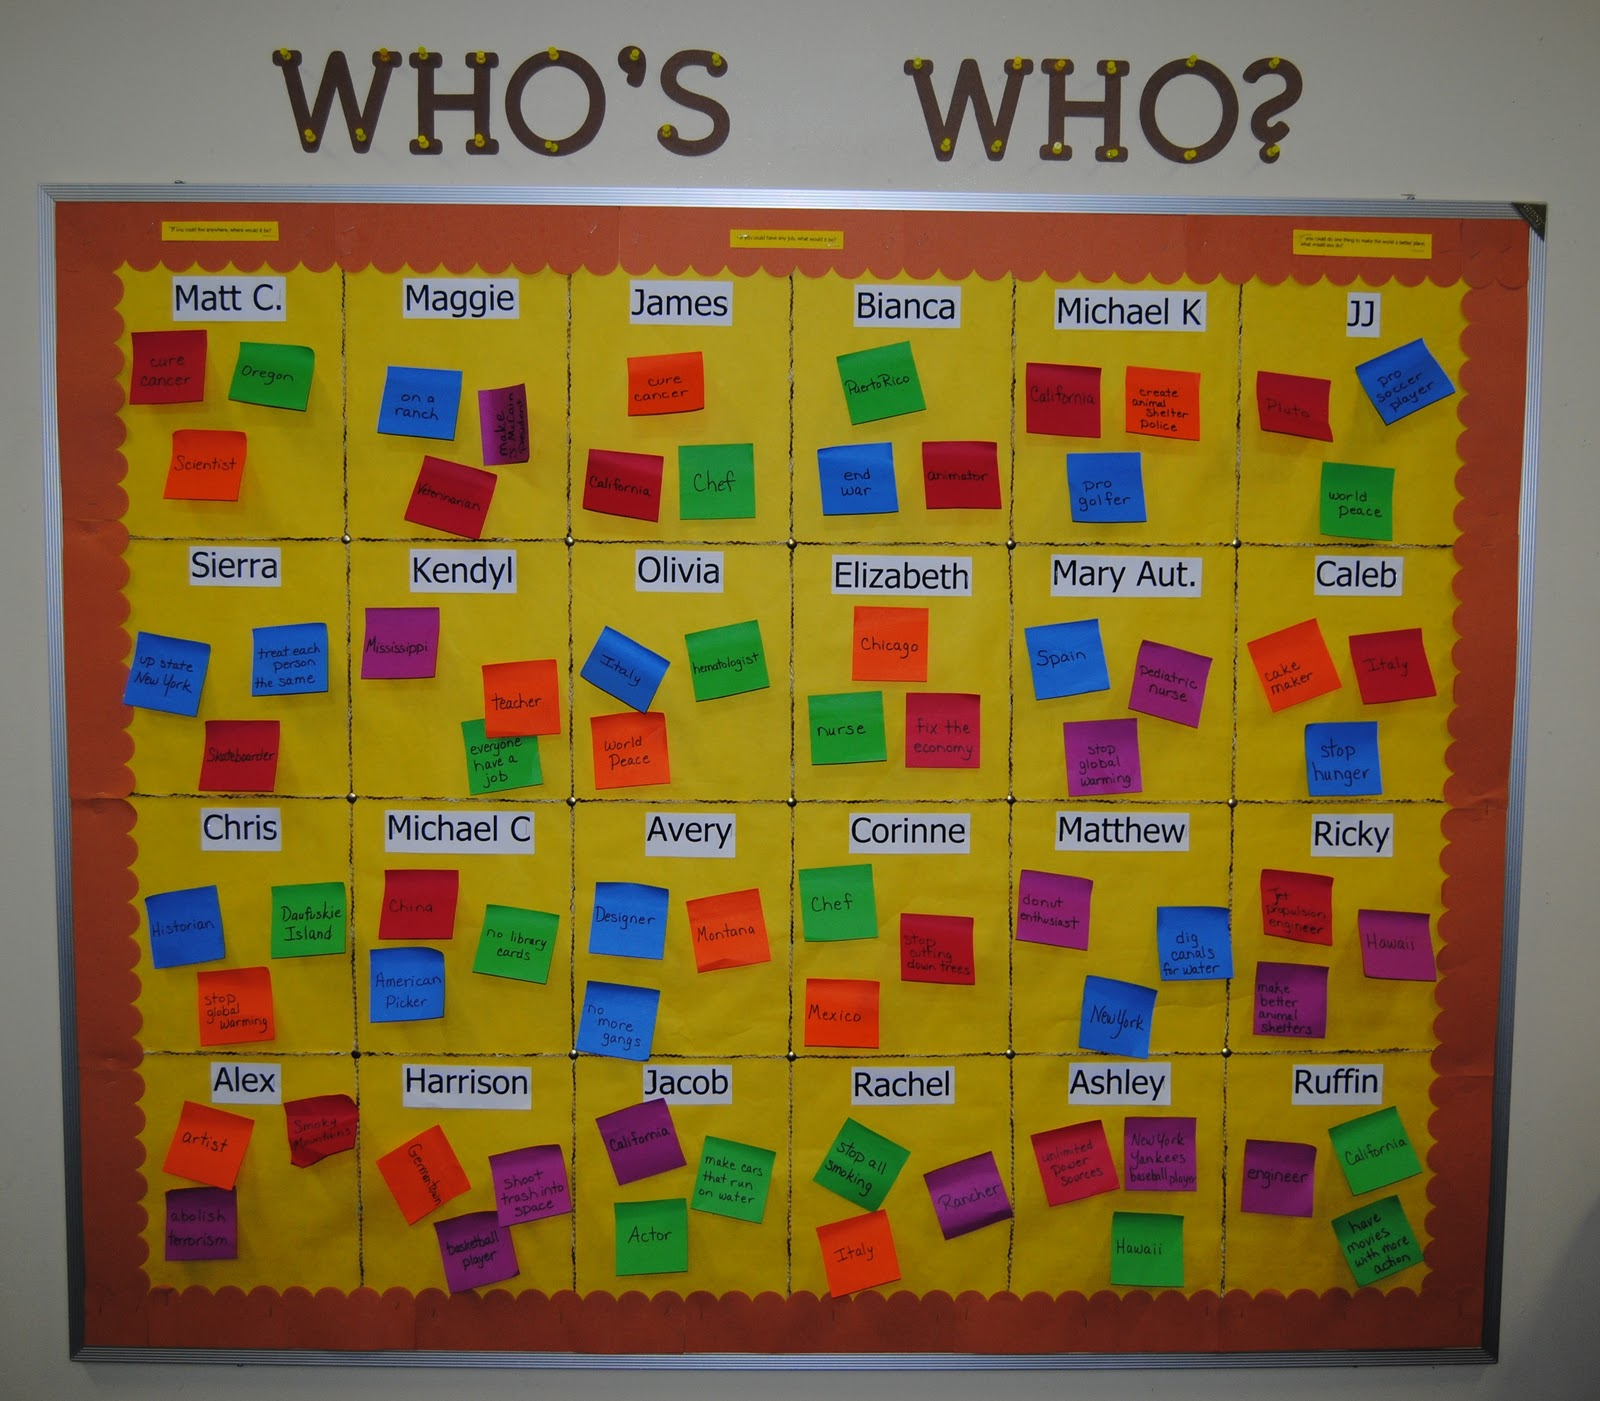 Inside Bodine Middle Schools Whos Who Bulletin Board